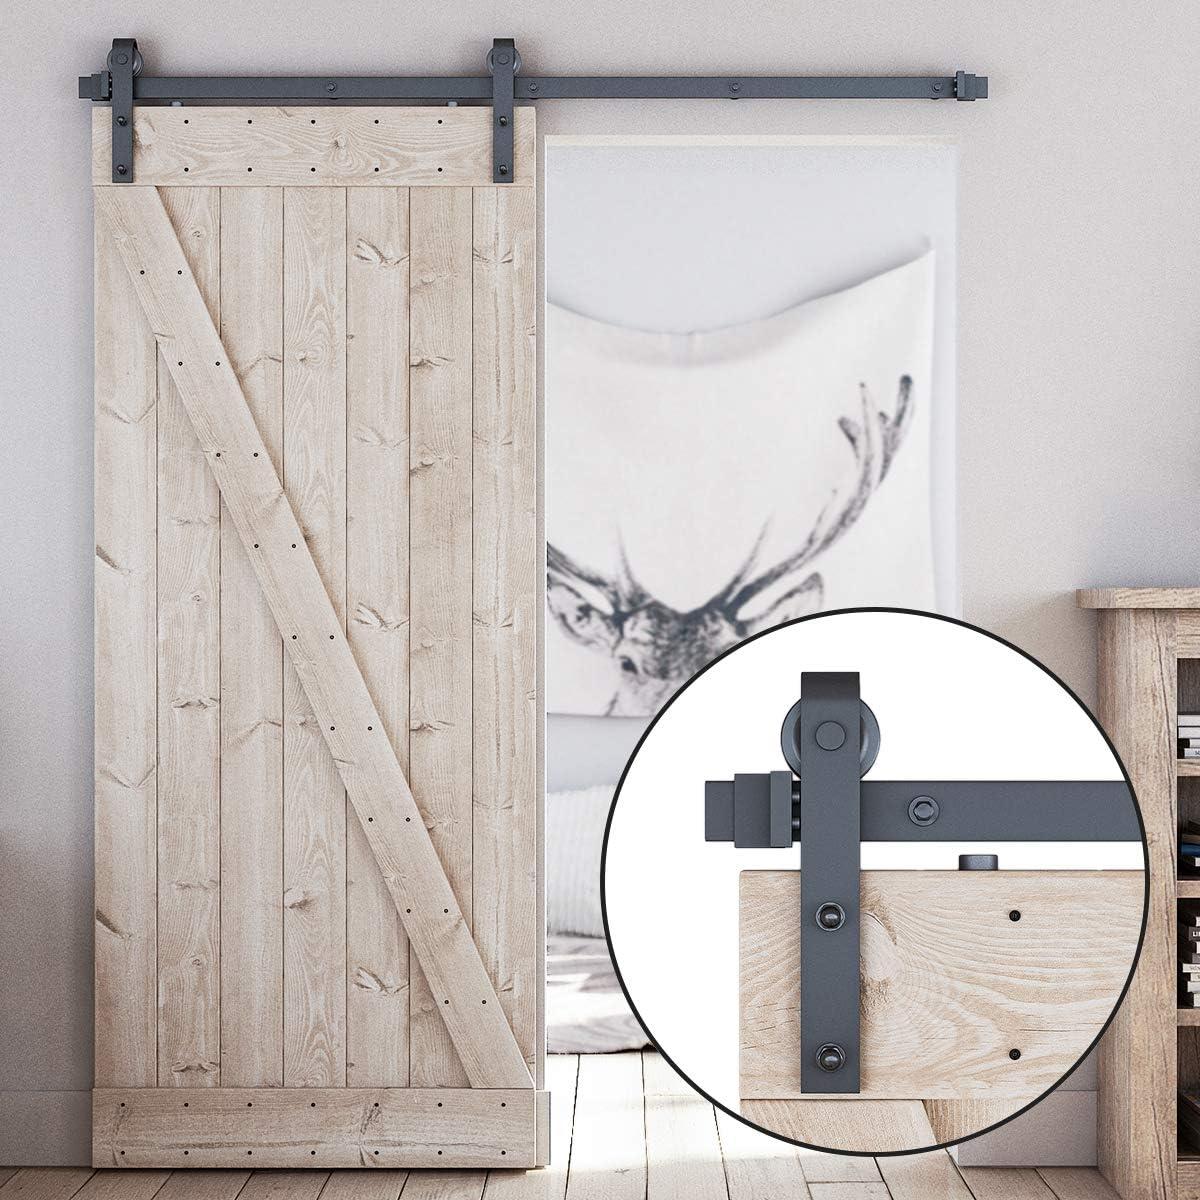 LDB_Building 6 FT Sliding Barn Door Hardware Kit, Upgraded Nylon Hanger, Easy to Install, Perfect for Kitchen, Living Room, Bathroom, Fit 1 3/8